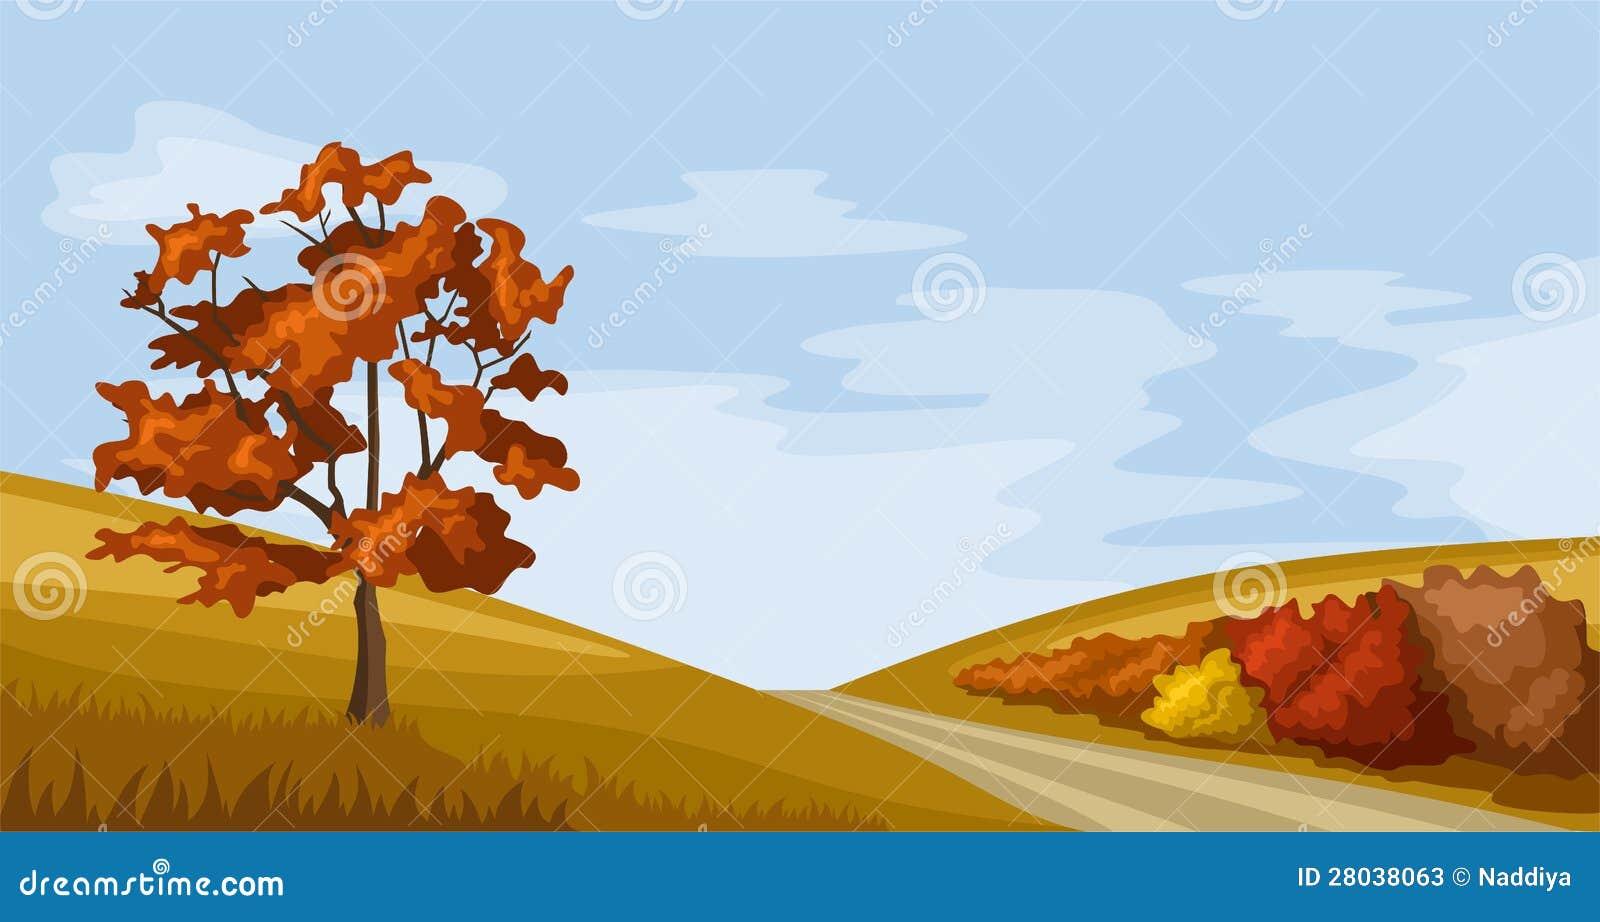 Landscape Illustration Vector Free: Autumn Landscape. Vector Illustration. Stock Vector